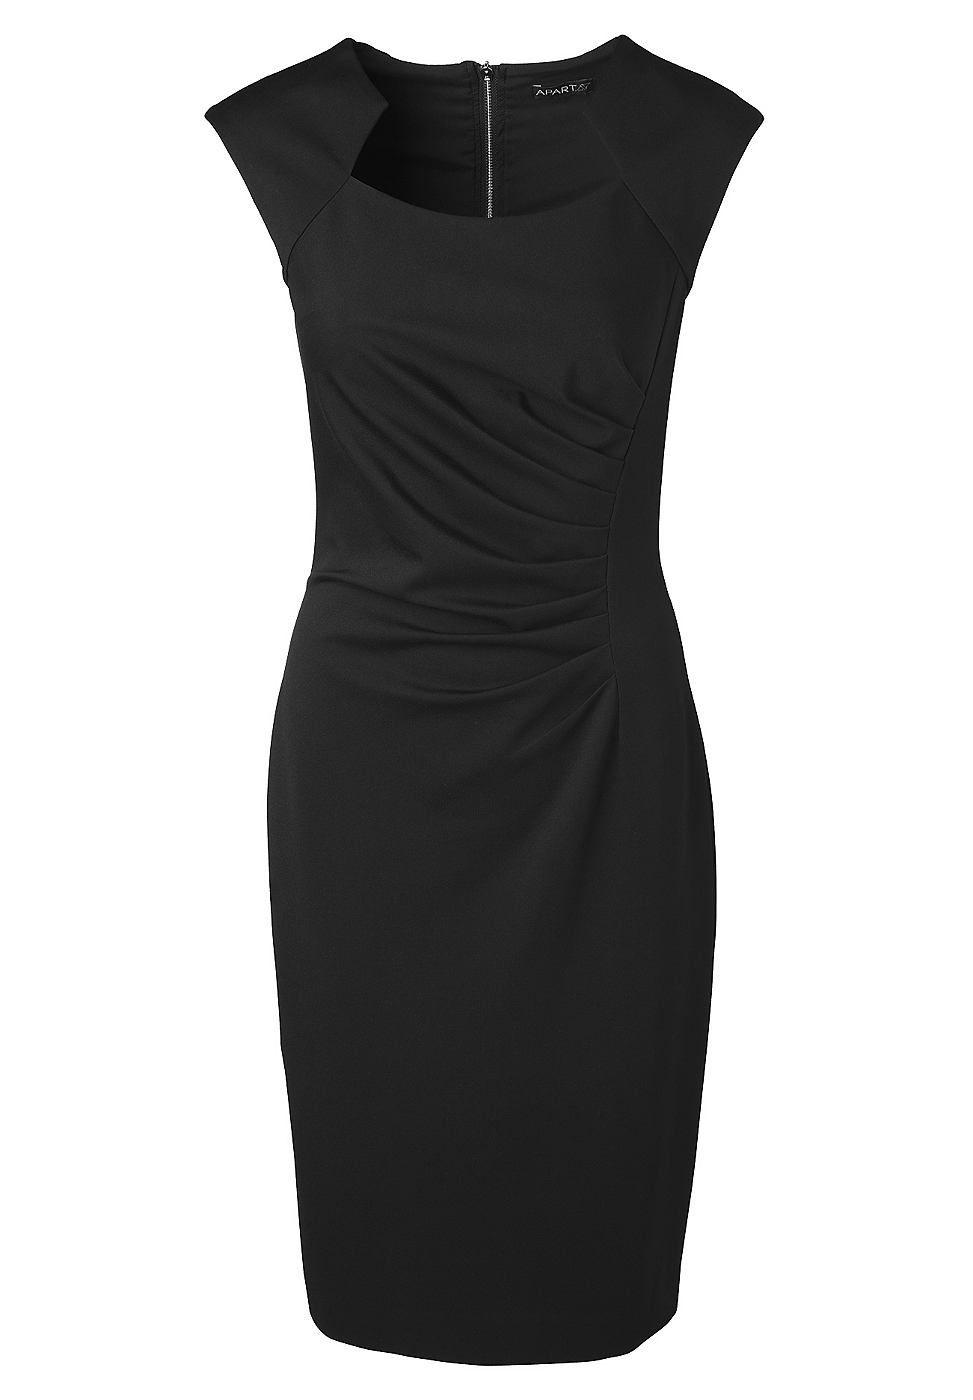 Apart Jerseykleid, körperbetontes Kleid online kaufen ...